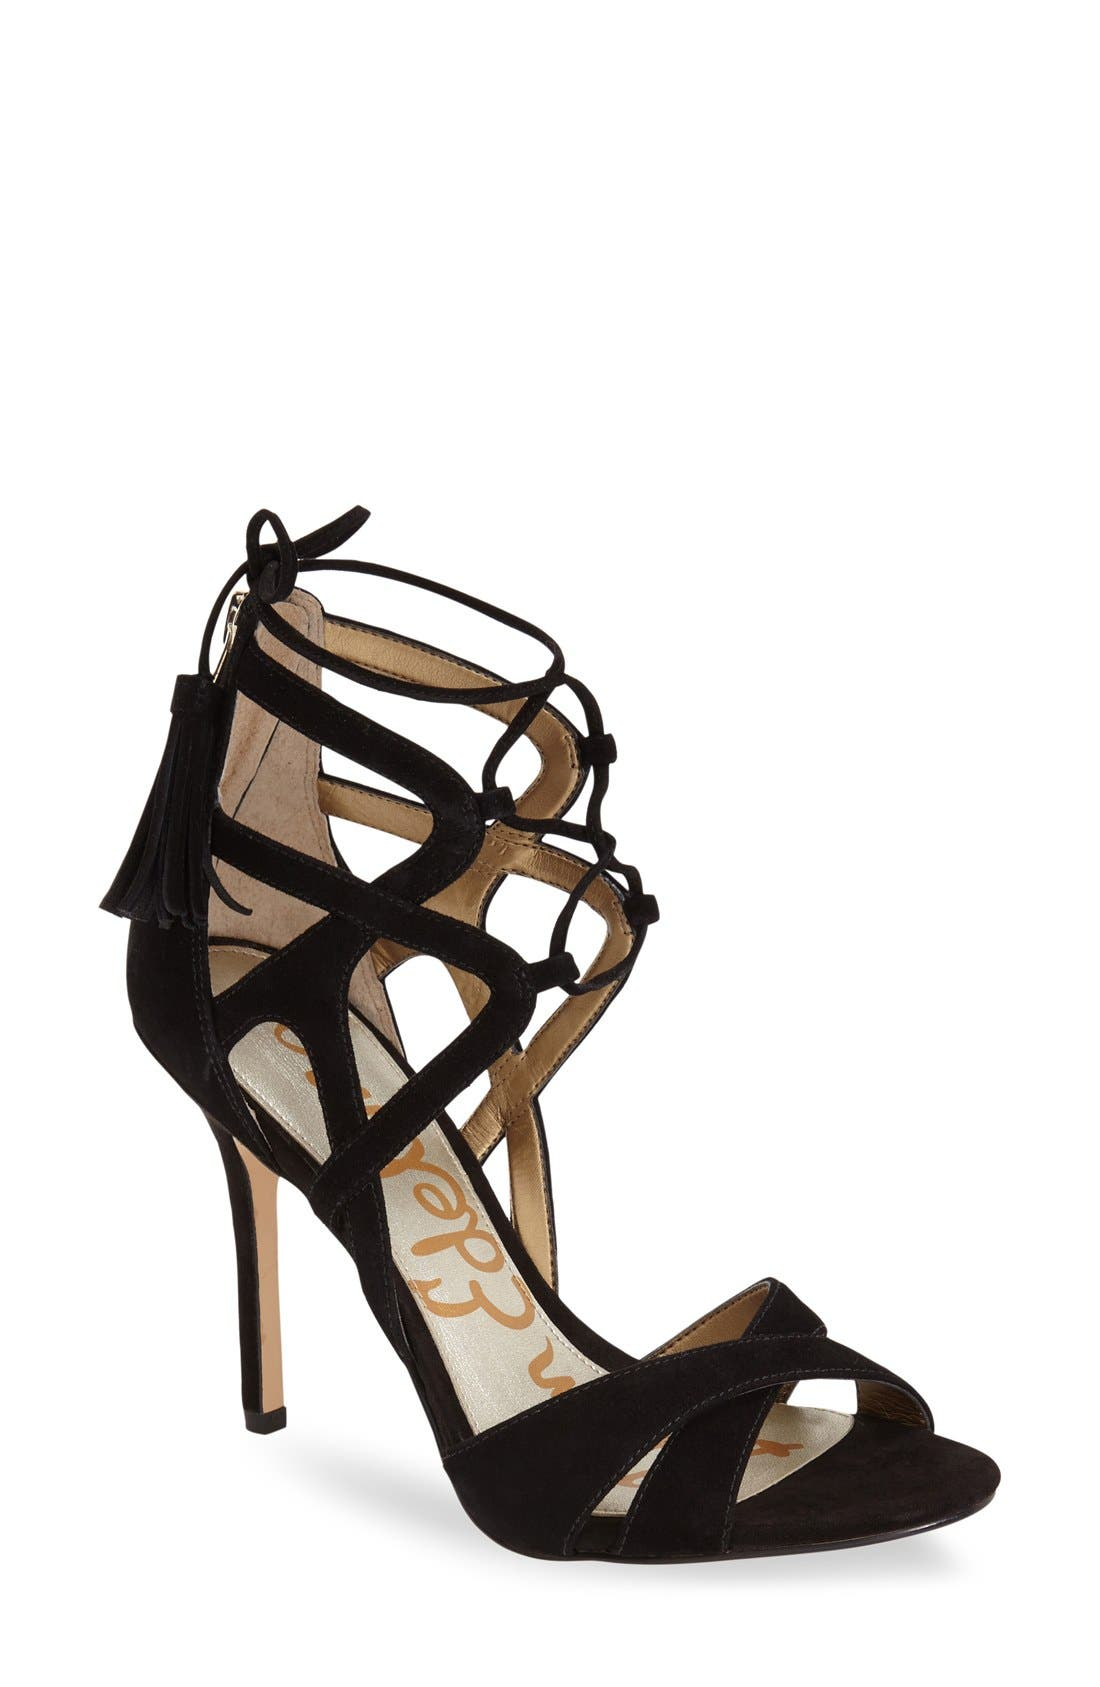 'Azela' Tasseled Lace-Up Sandal,                             Main thumbnail 1, color,                             Black Suede